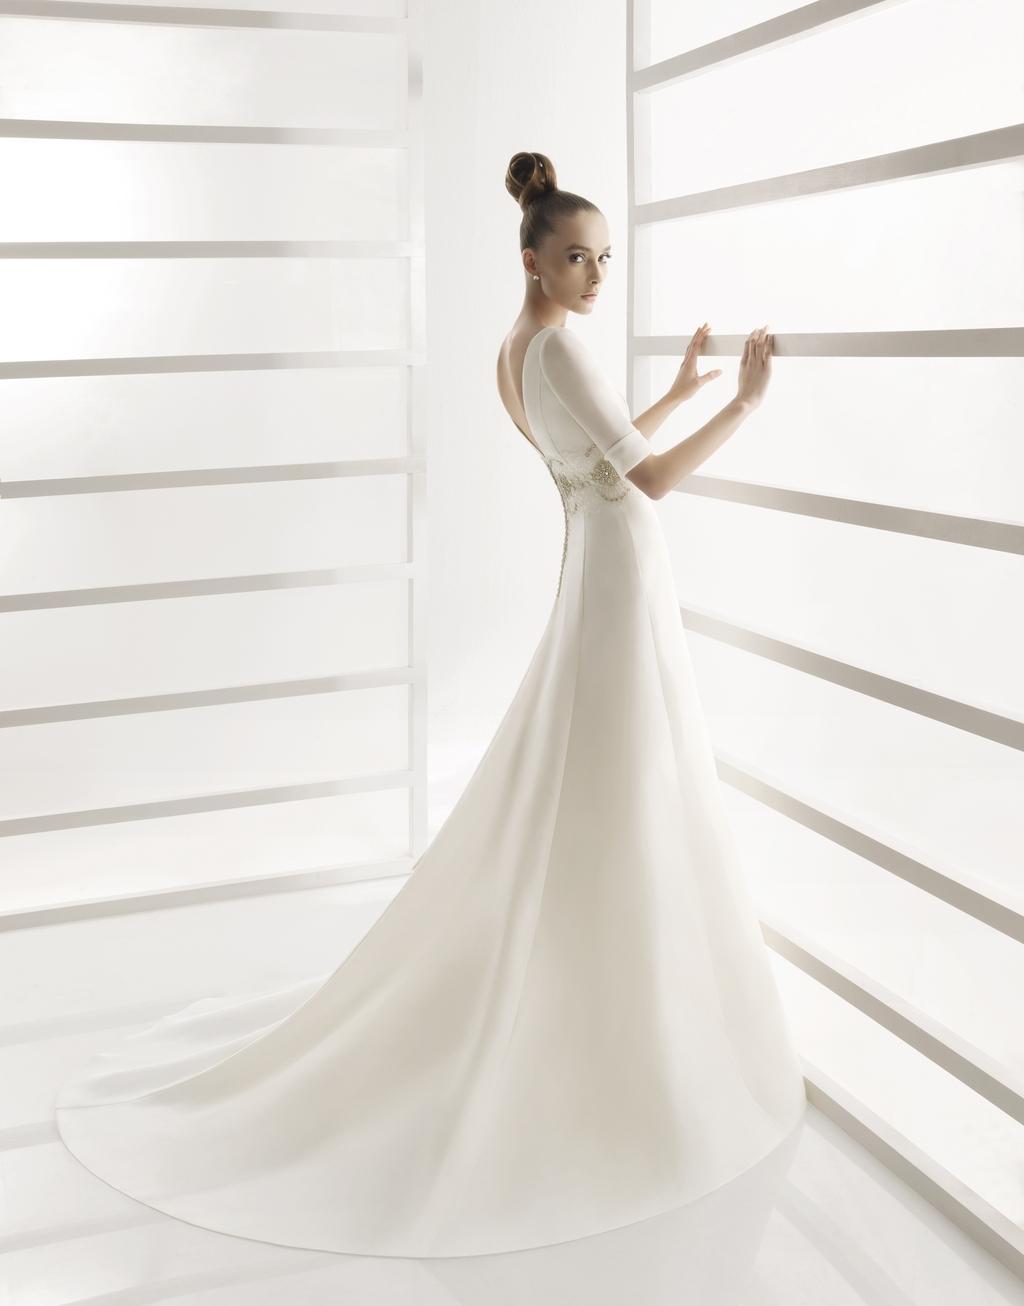 113-ef_mero-2011-wedding-dress-rosa-clara-three-quarter-sleeves-high-neck-back.full